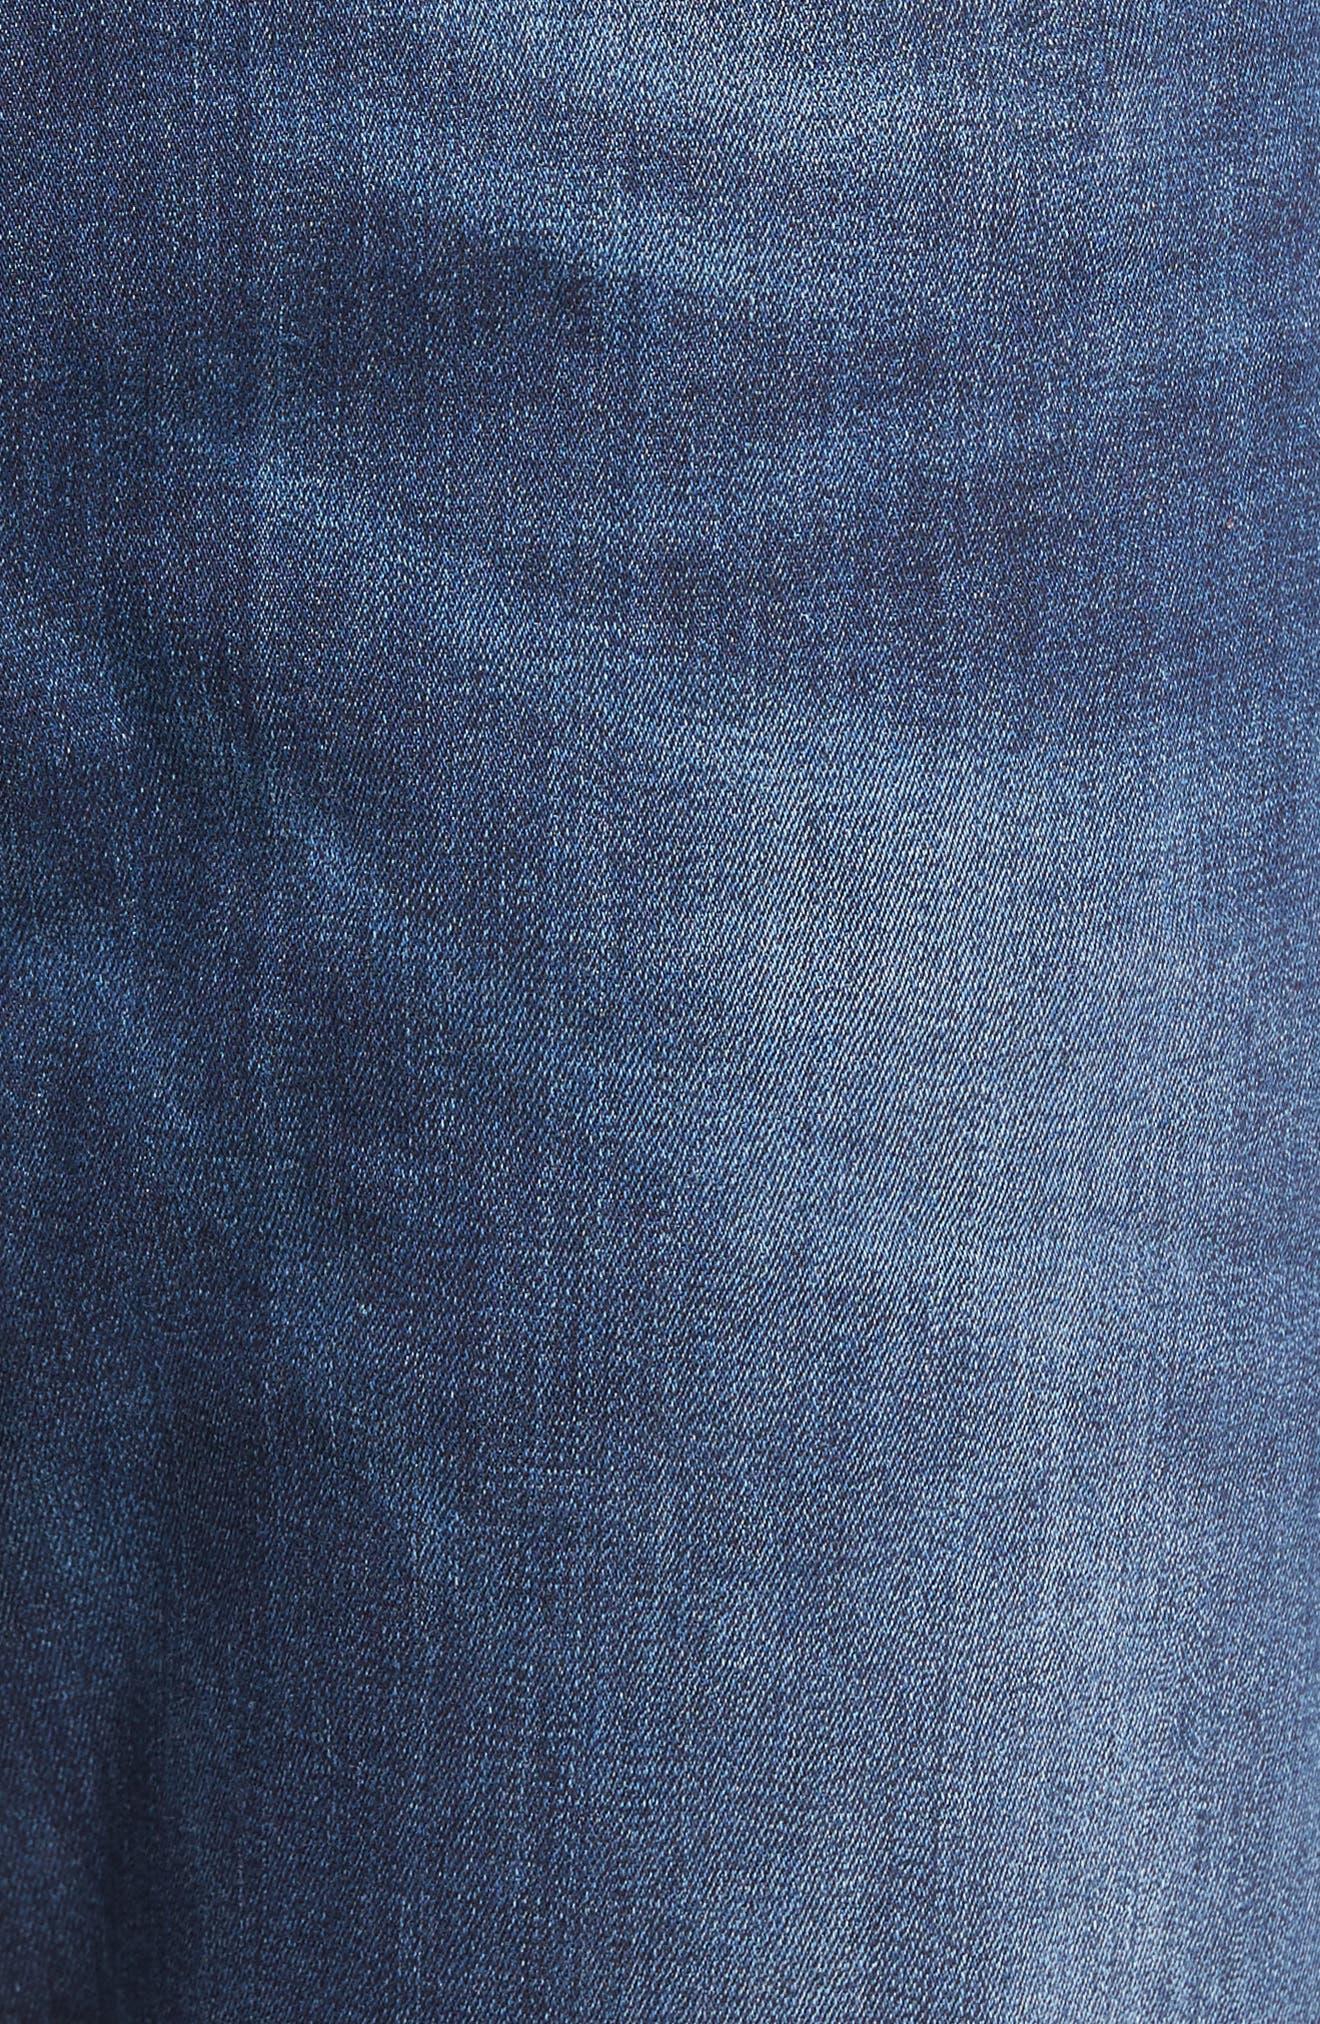 Waykee Straight Leg Jeans,                             Alternate thumbnail 5, color,                             0679I